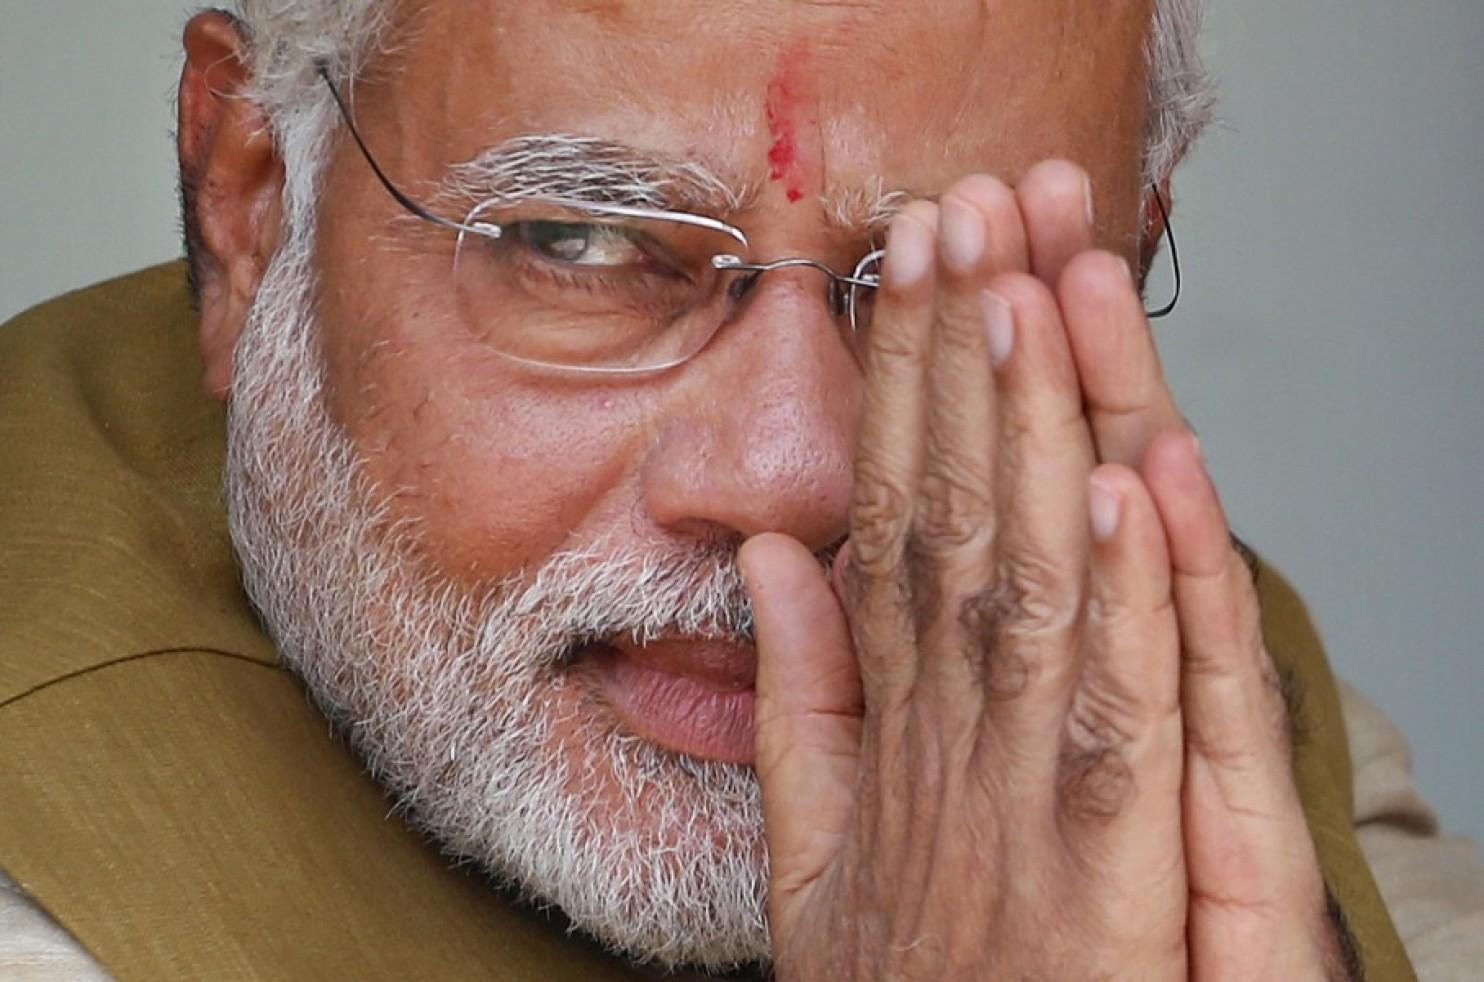 Bharatiya Janata Party leader and Indian Prime Minister Narendra Modi.